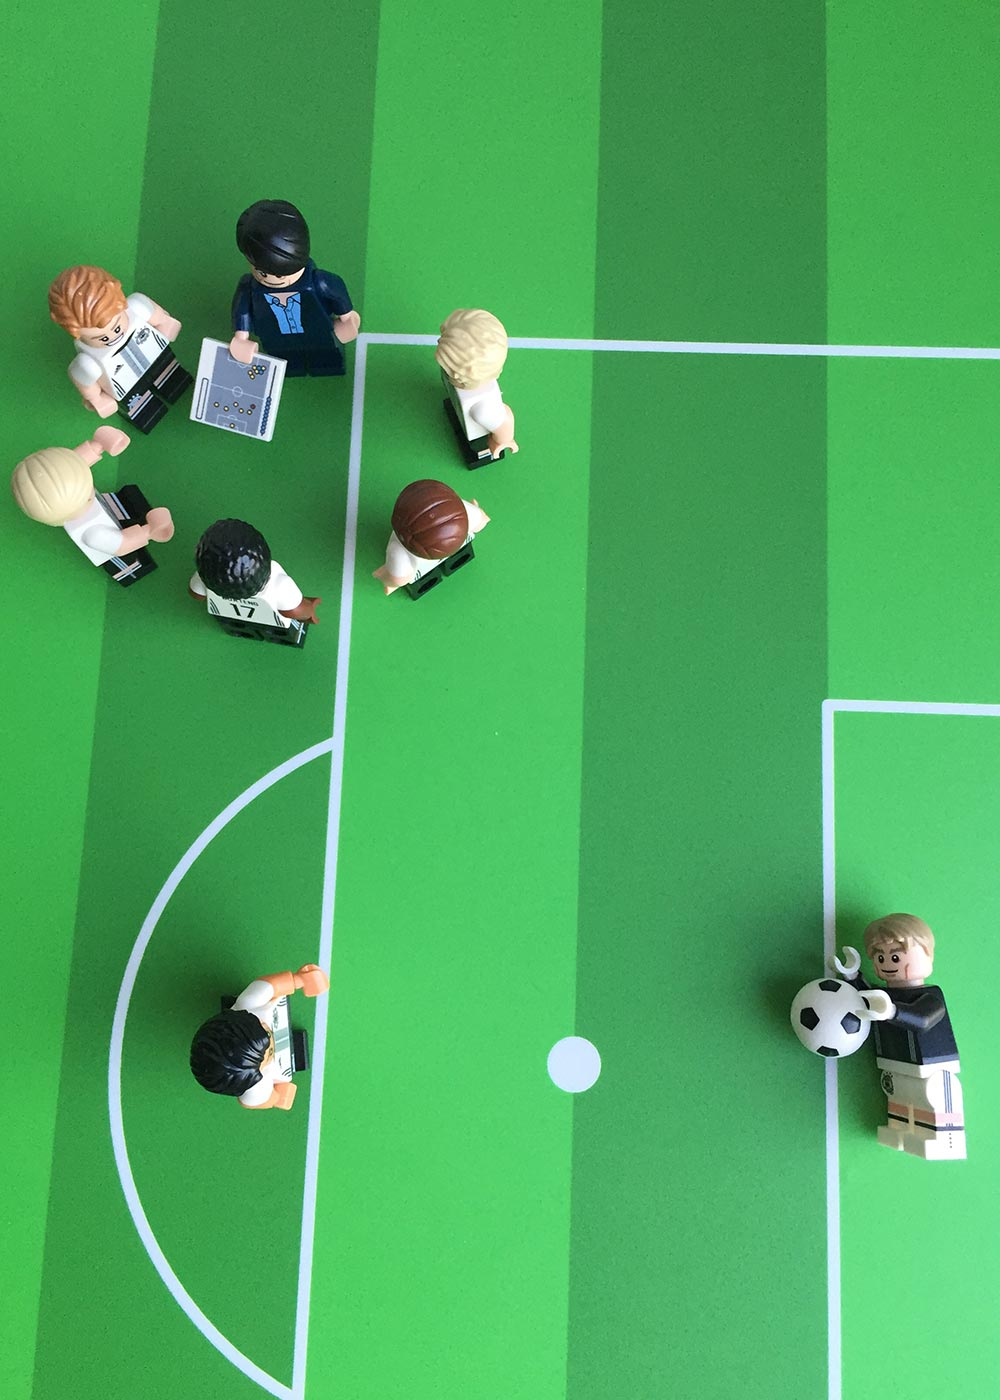 Ikea Smastad Bank Fussballfeld grün Elfmeter